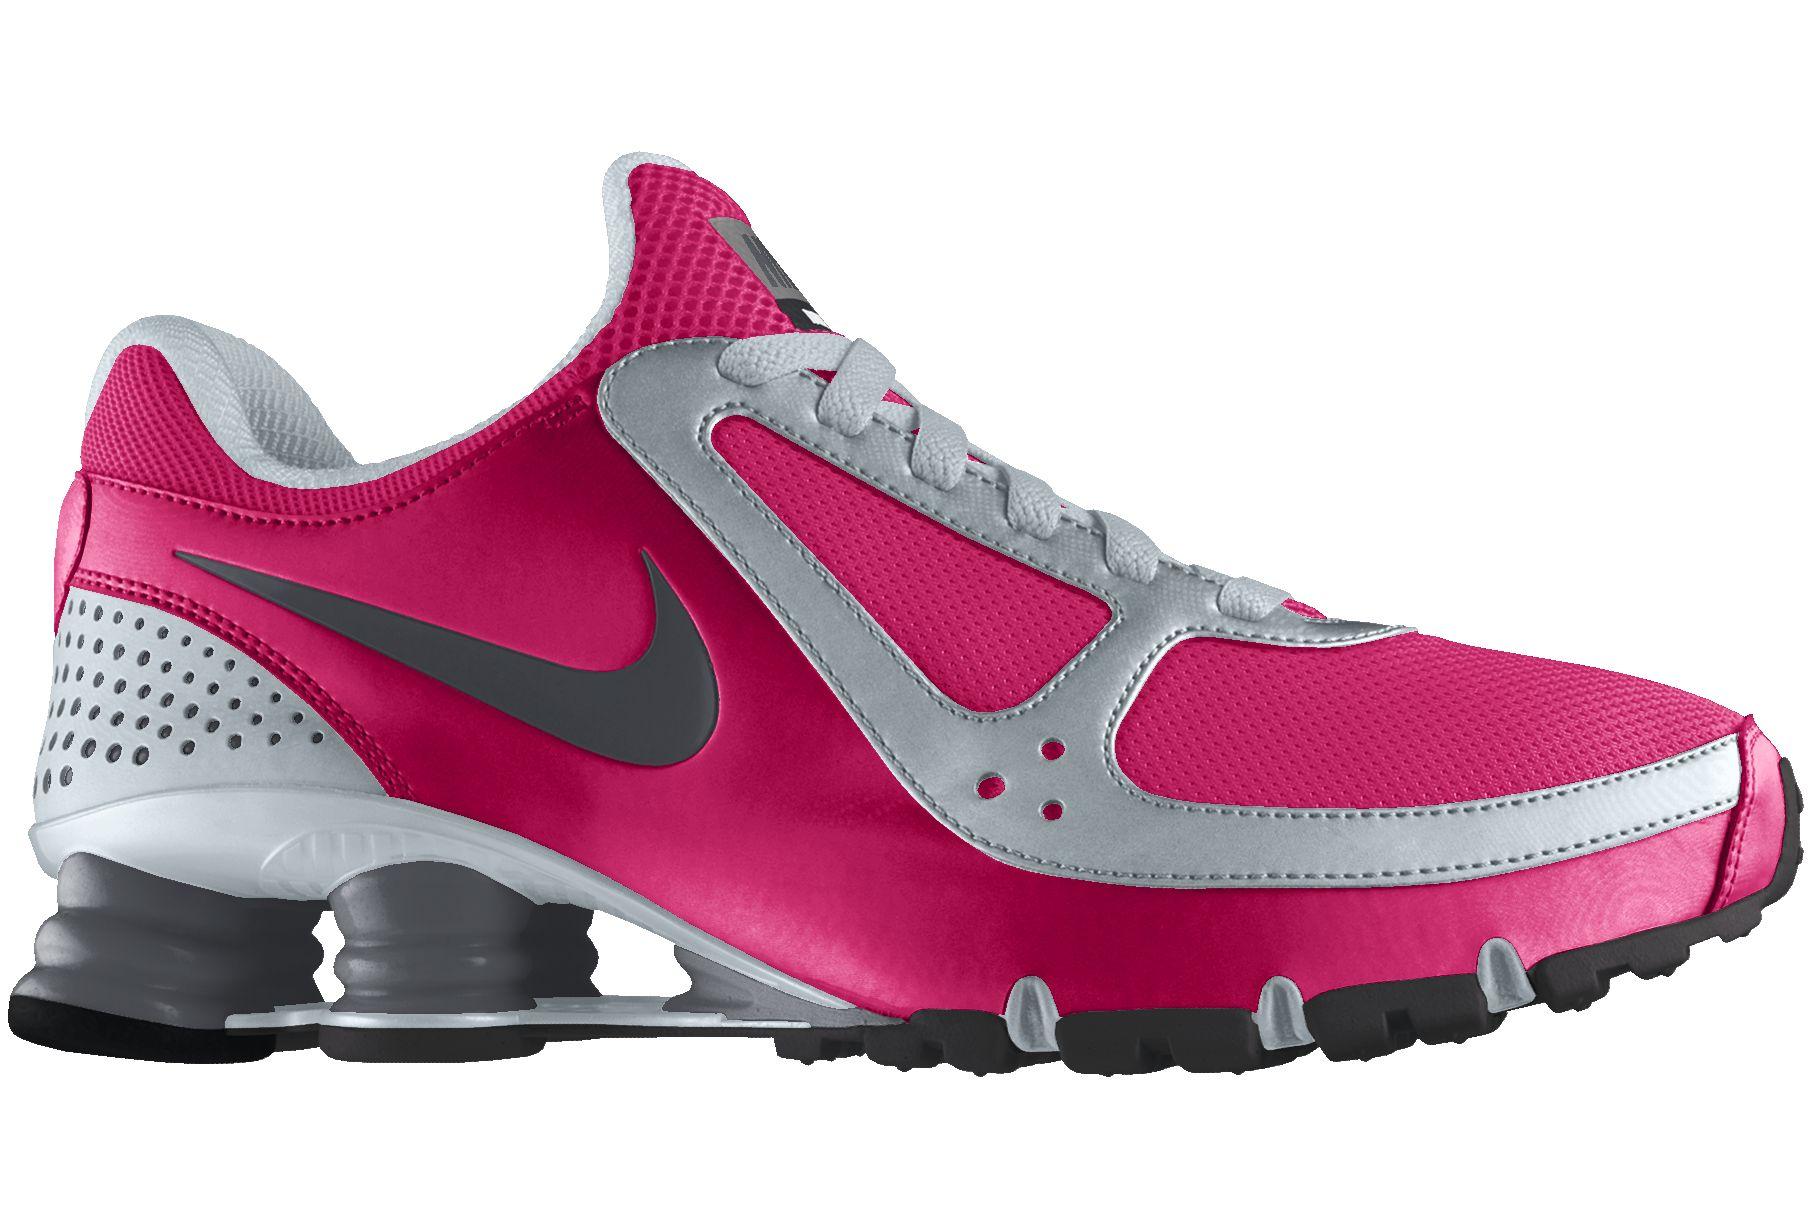 Custom Make Nike Shoes Australia